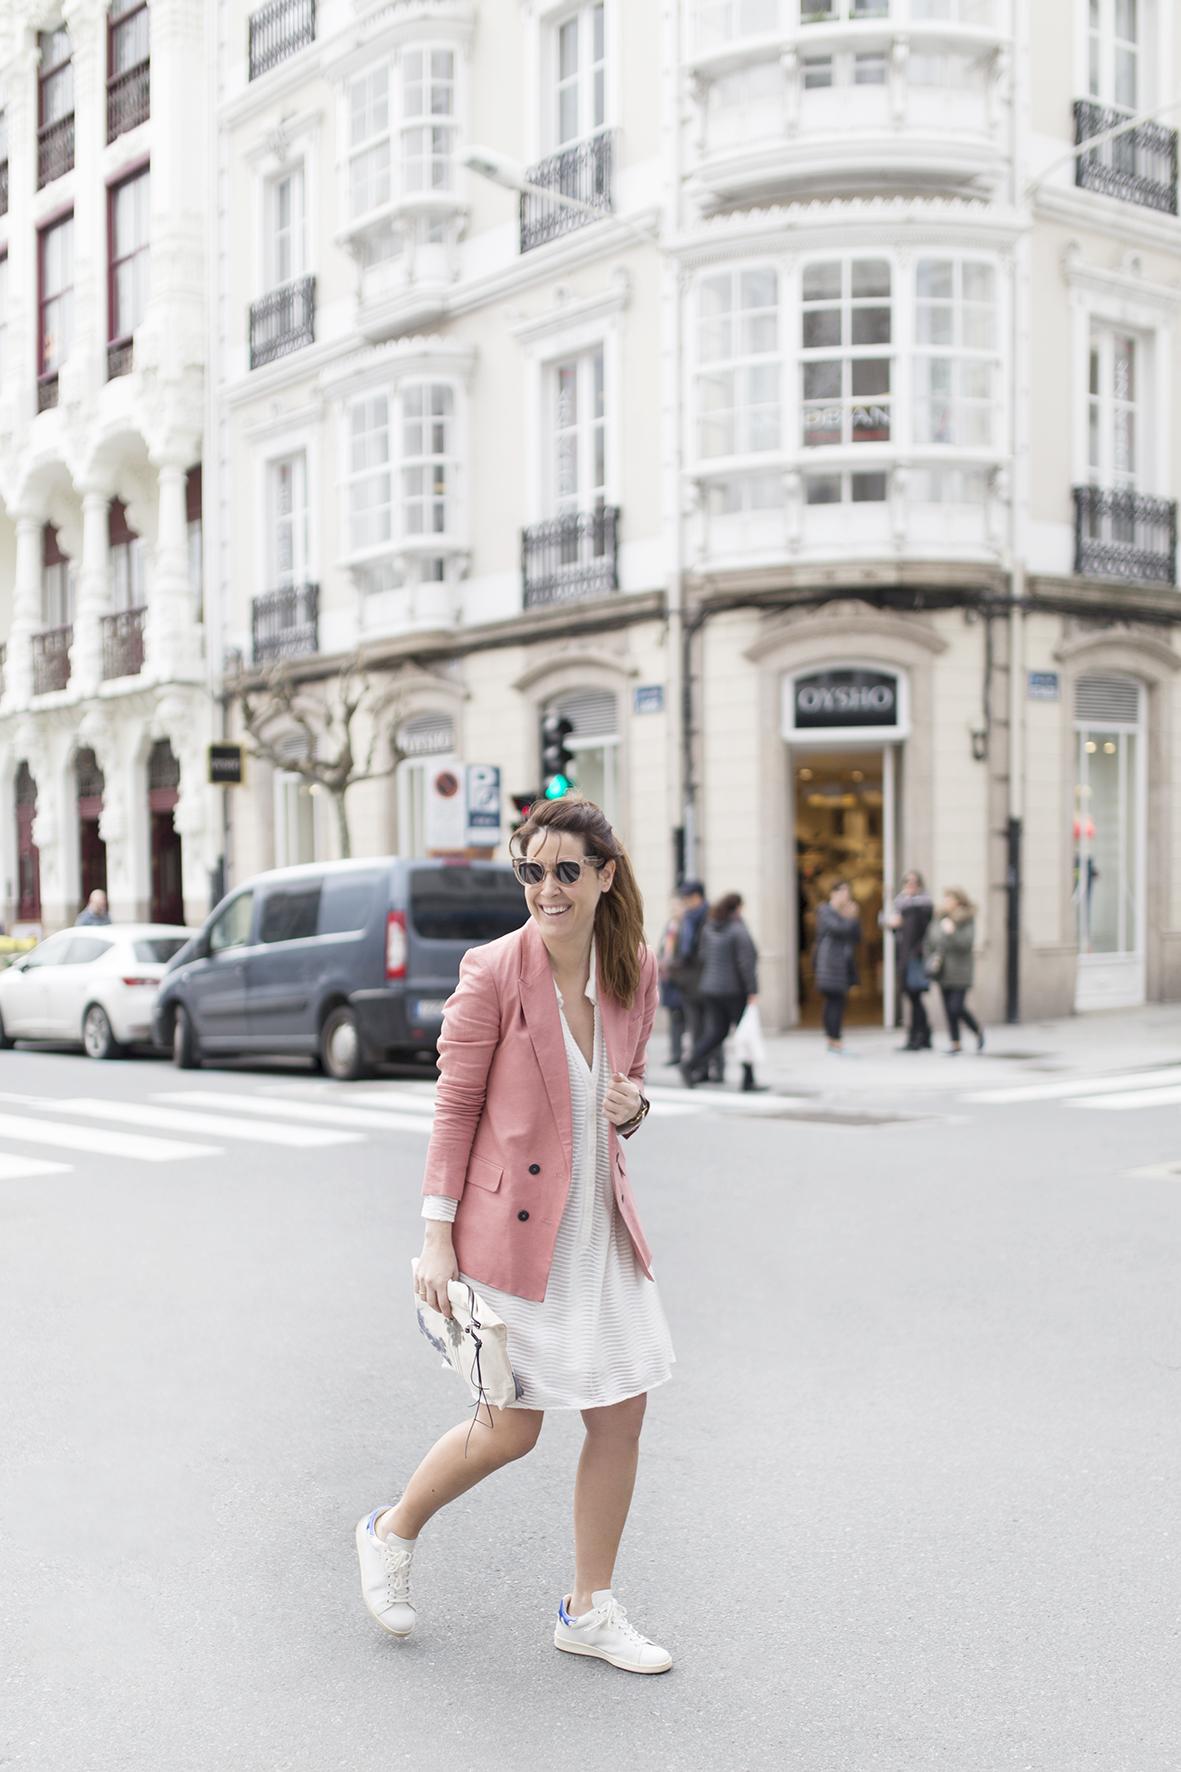 SILVER LAKE zubi -moda-calle-Coruña-Mango blazer -cèline sunglasses-fashion-Voglia-streetstye-descalzaporelparque-Isabel Marant sneakers